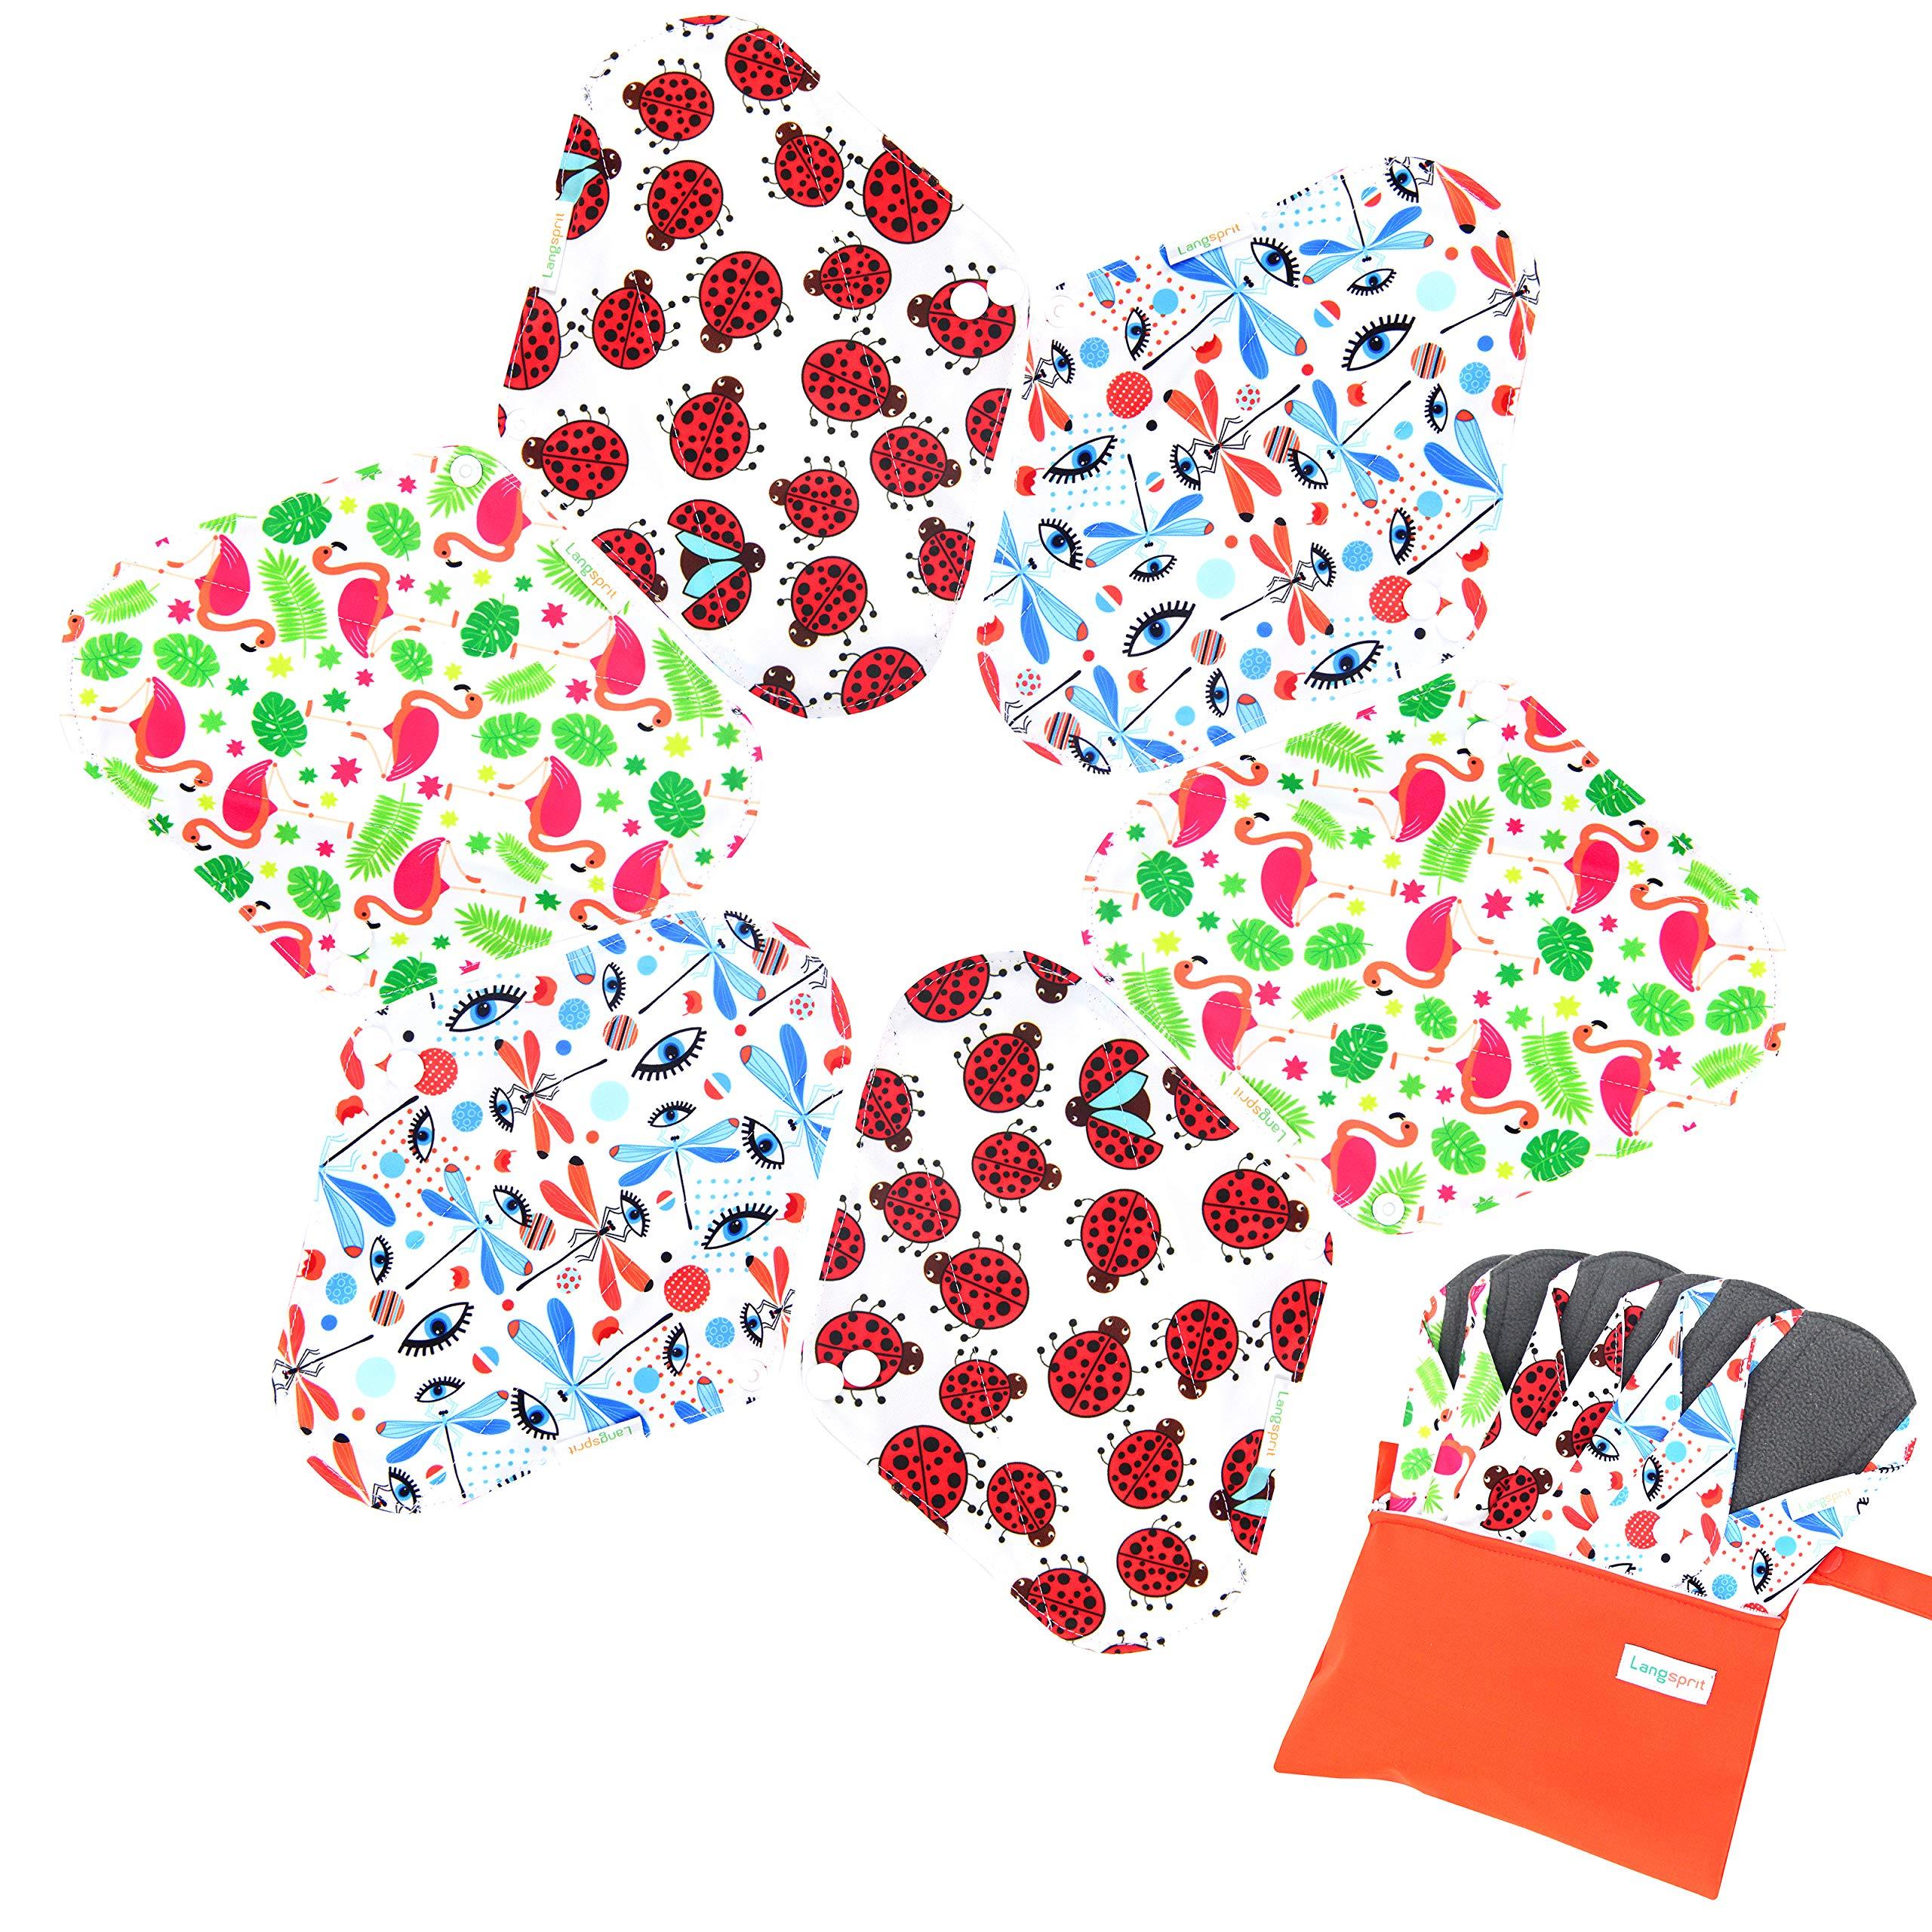 7pcs Set 1 pc Bonus Free Mini Wet Bag +6pcs Absorbent Reusable Sanitary Pads/Washable Bamboo Cloth Menstrual Pads (M,Gorgeous)